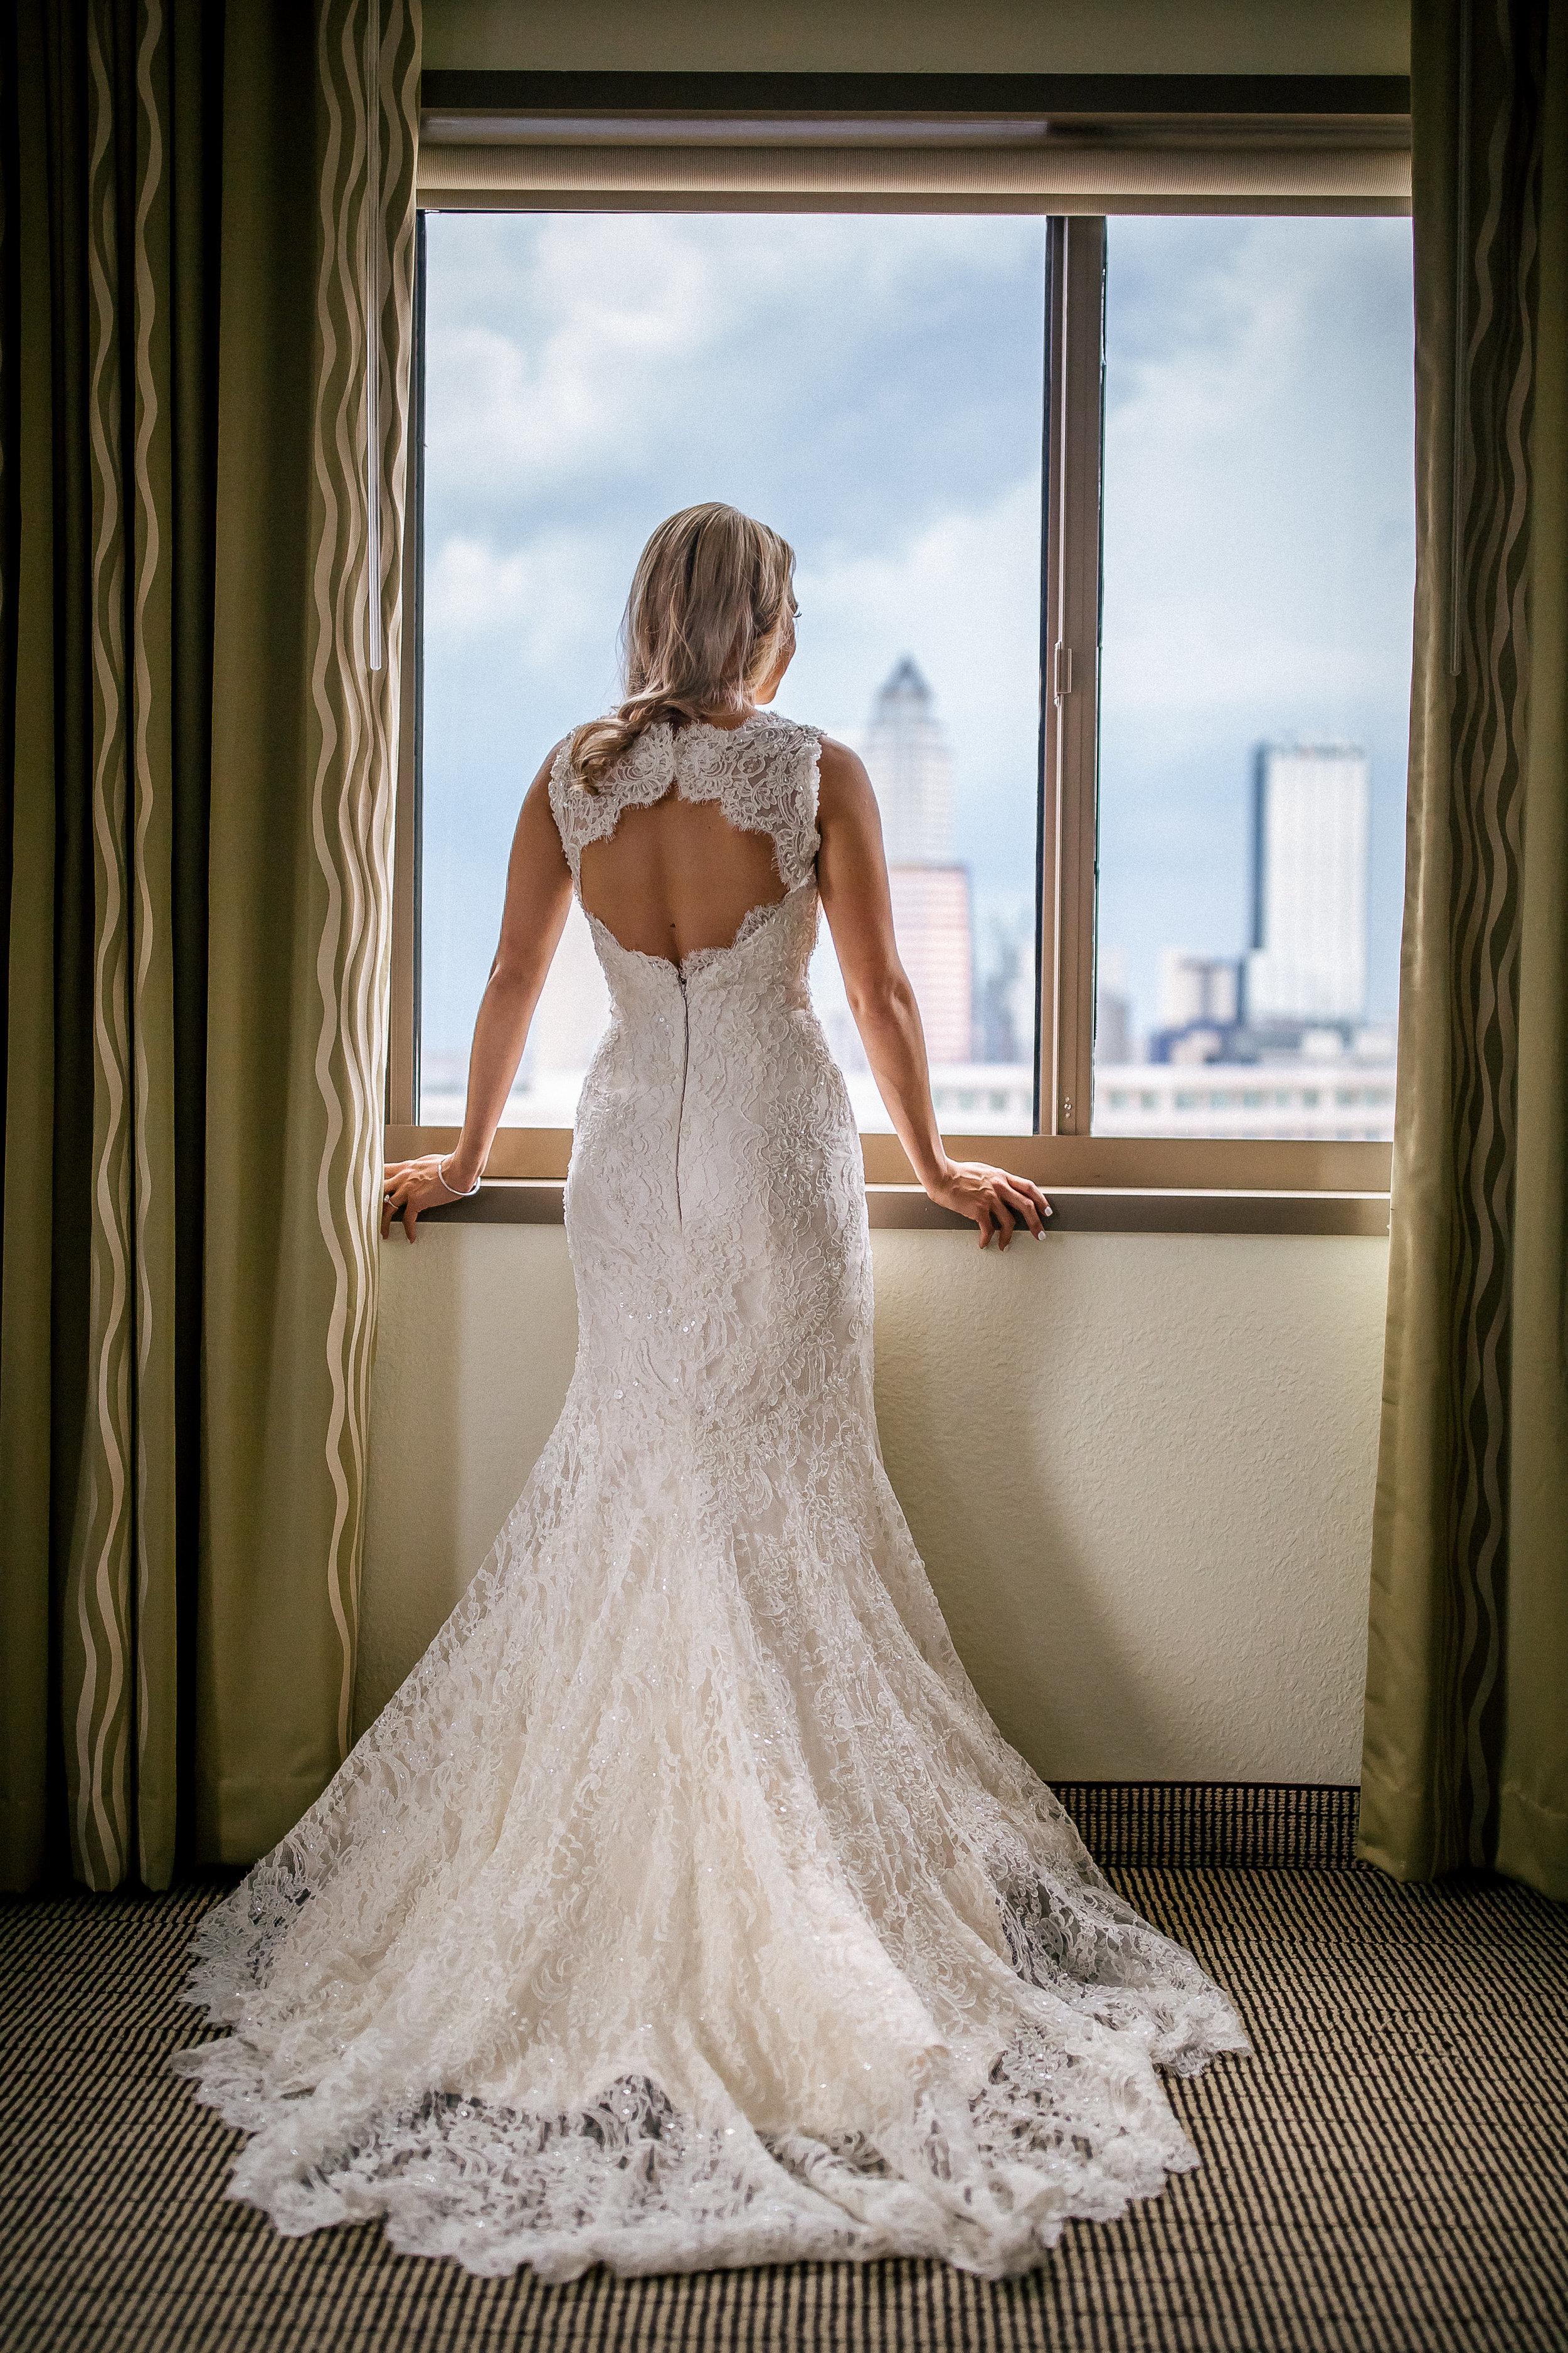 Roberts Wedding-Roberts Wedding 2016 JPEG-0128.jpeg